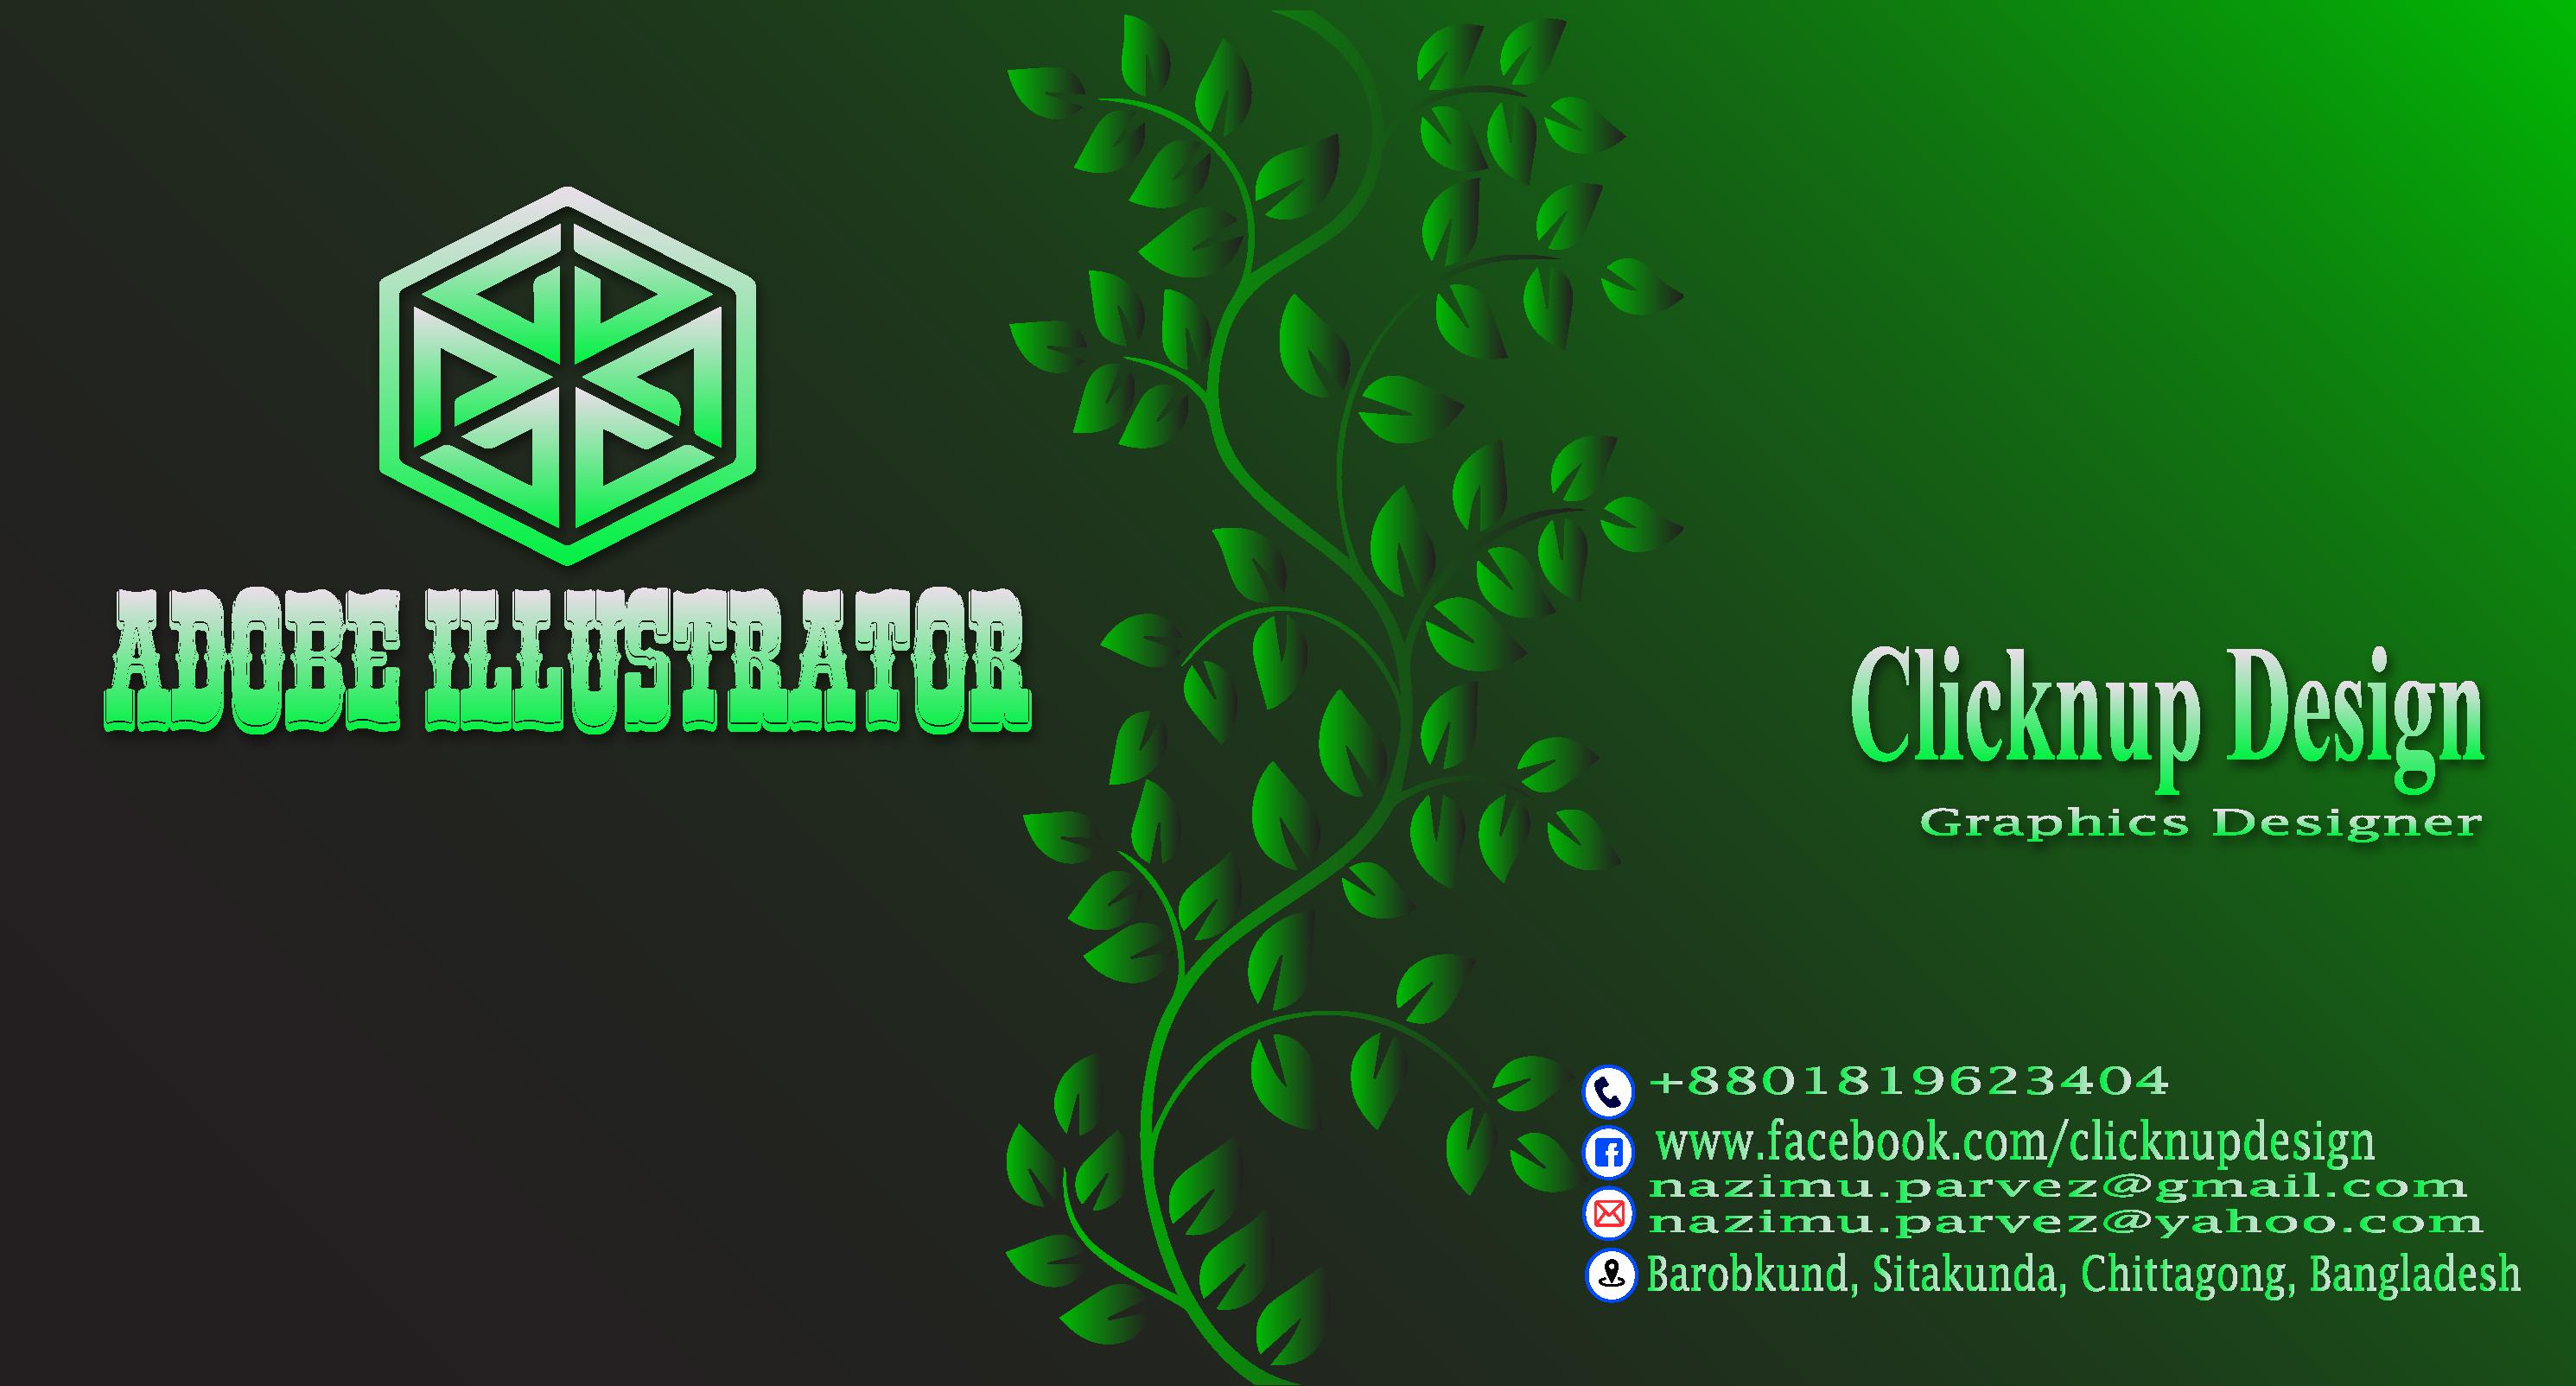 Maximum Uniqe Quality Professional and Update Business Card & logo Design